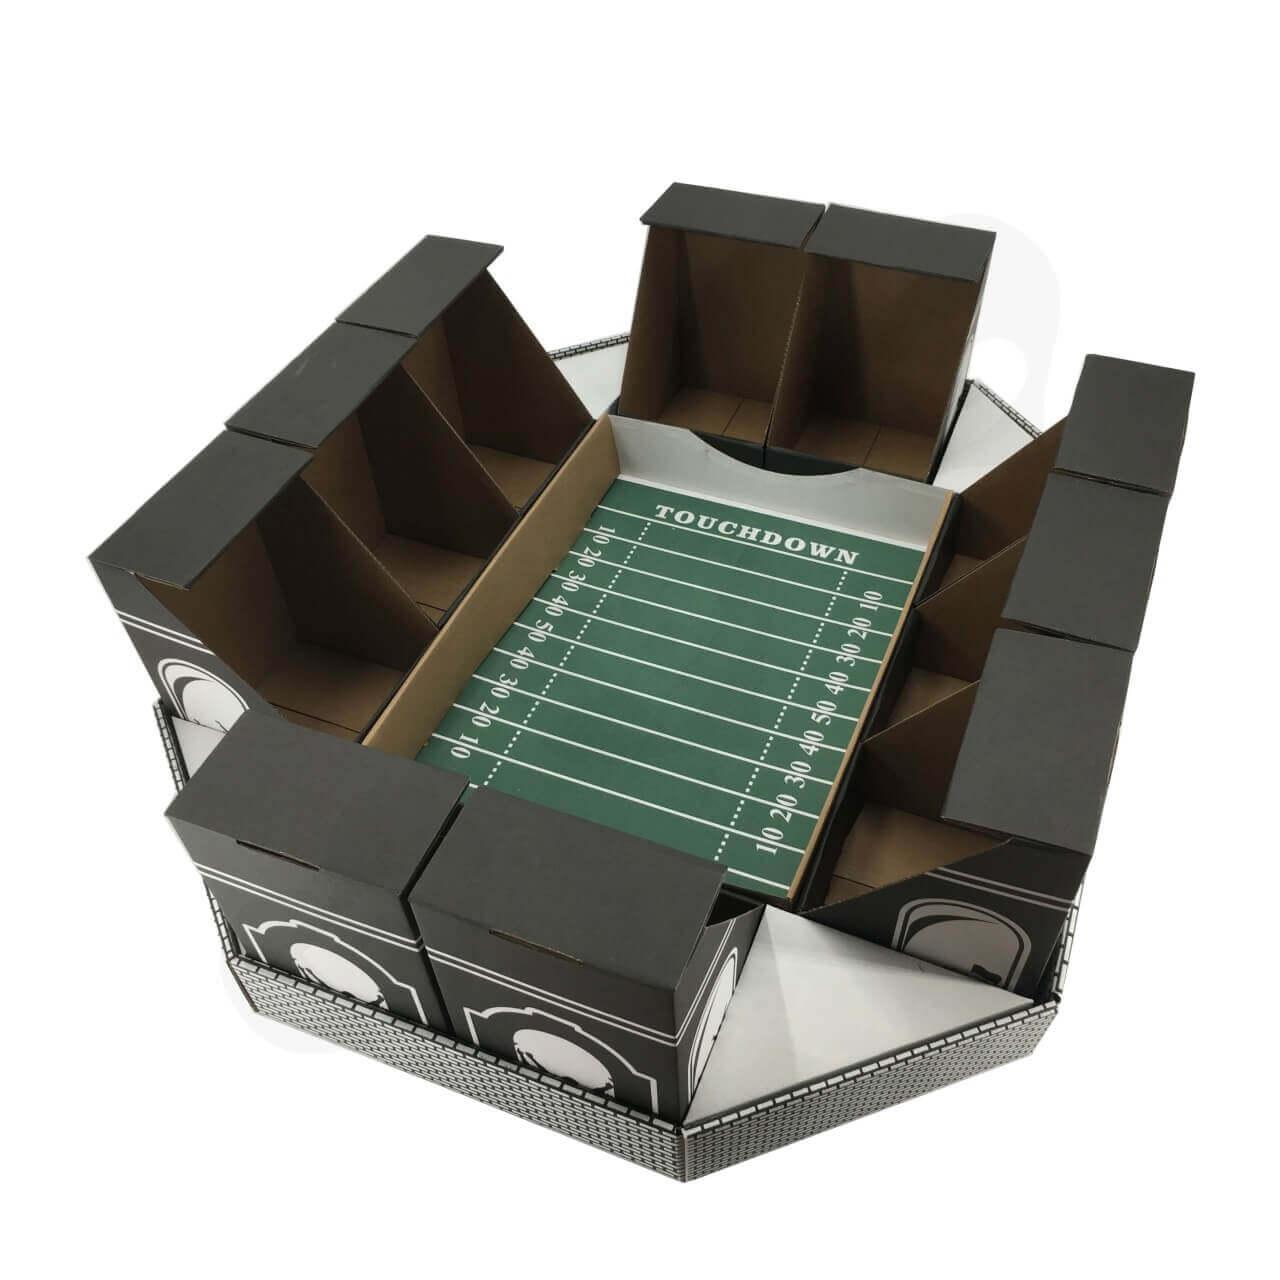 Cardboard Snack Stadium Super Bowl 1